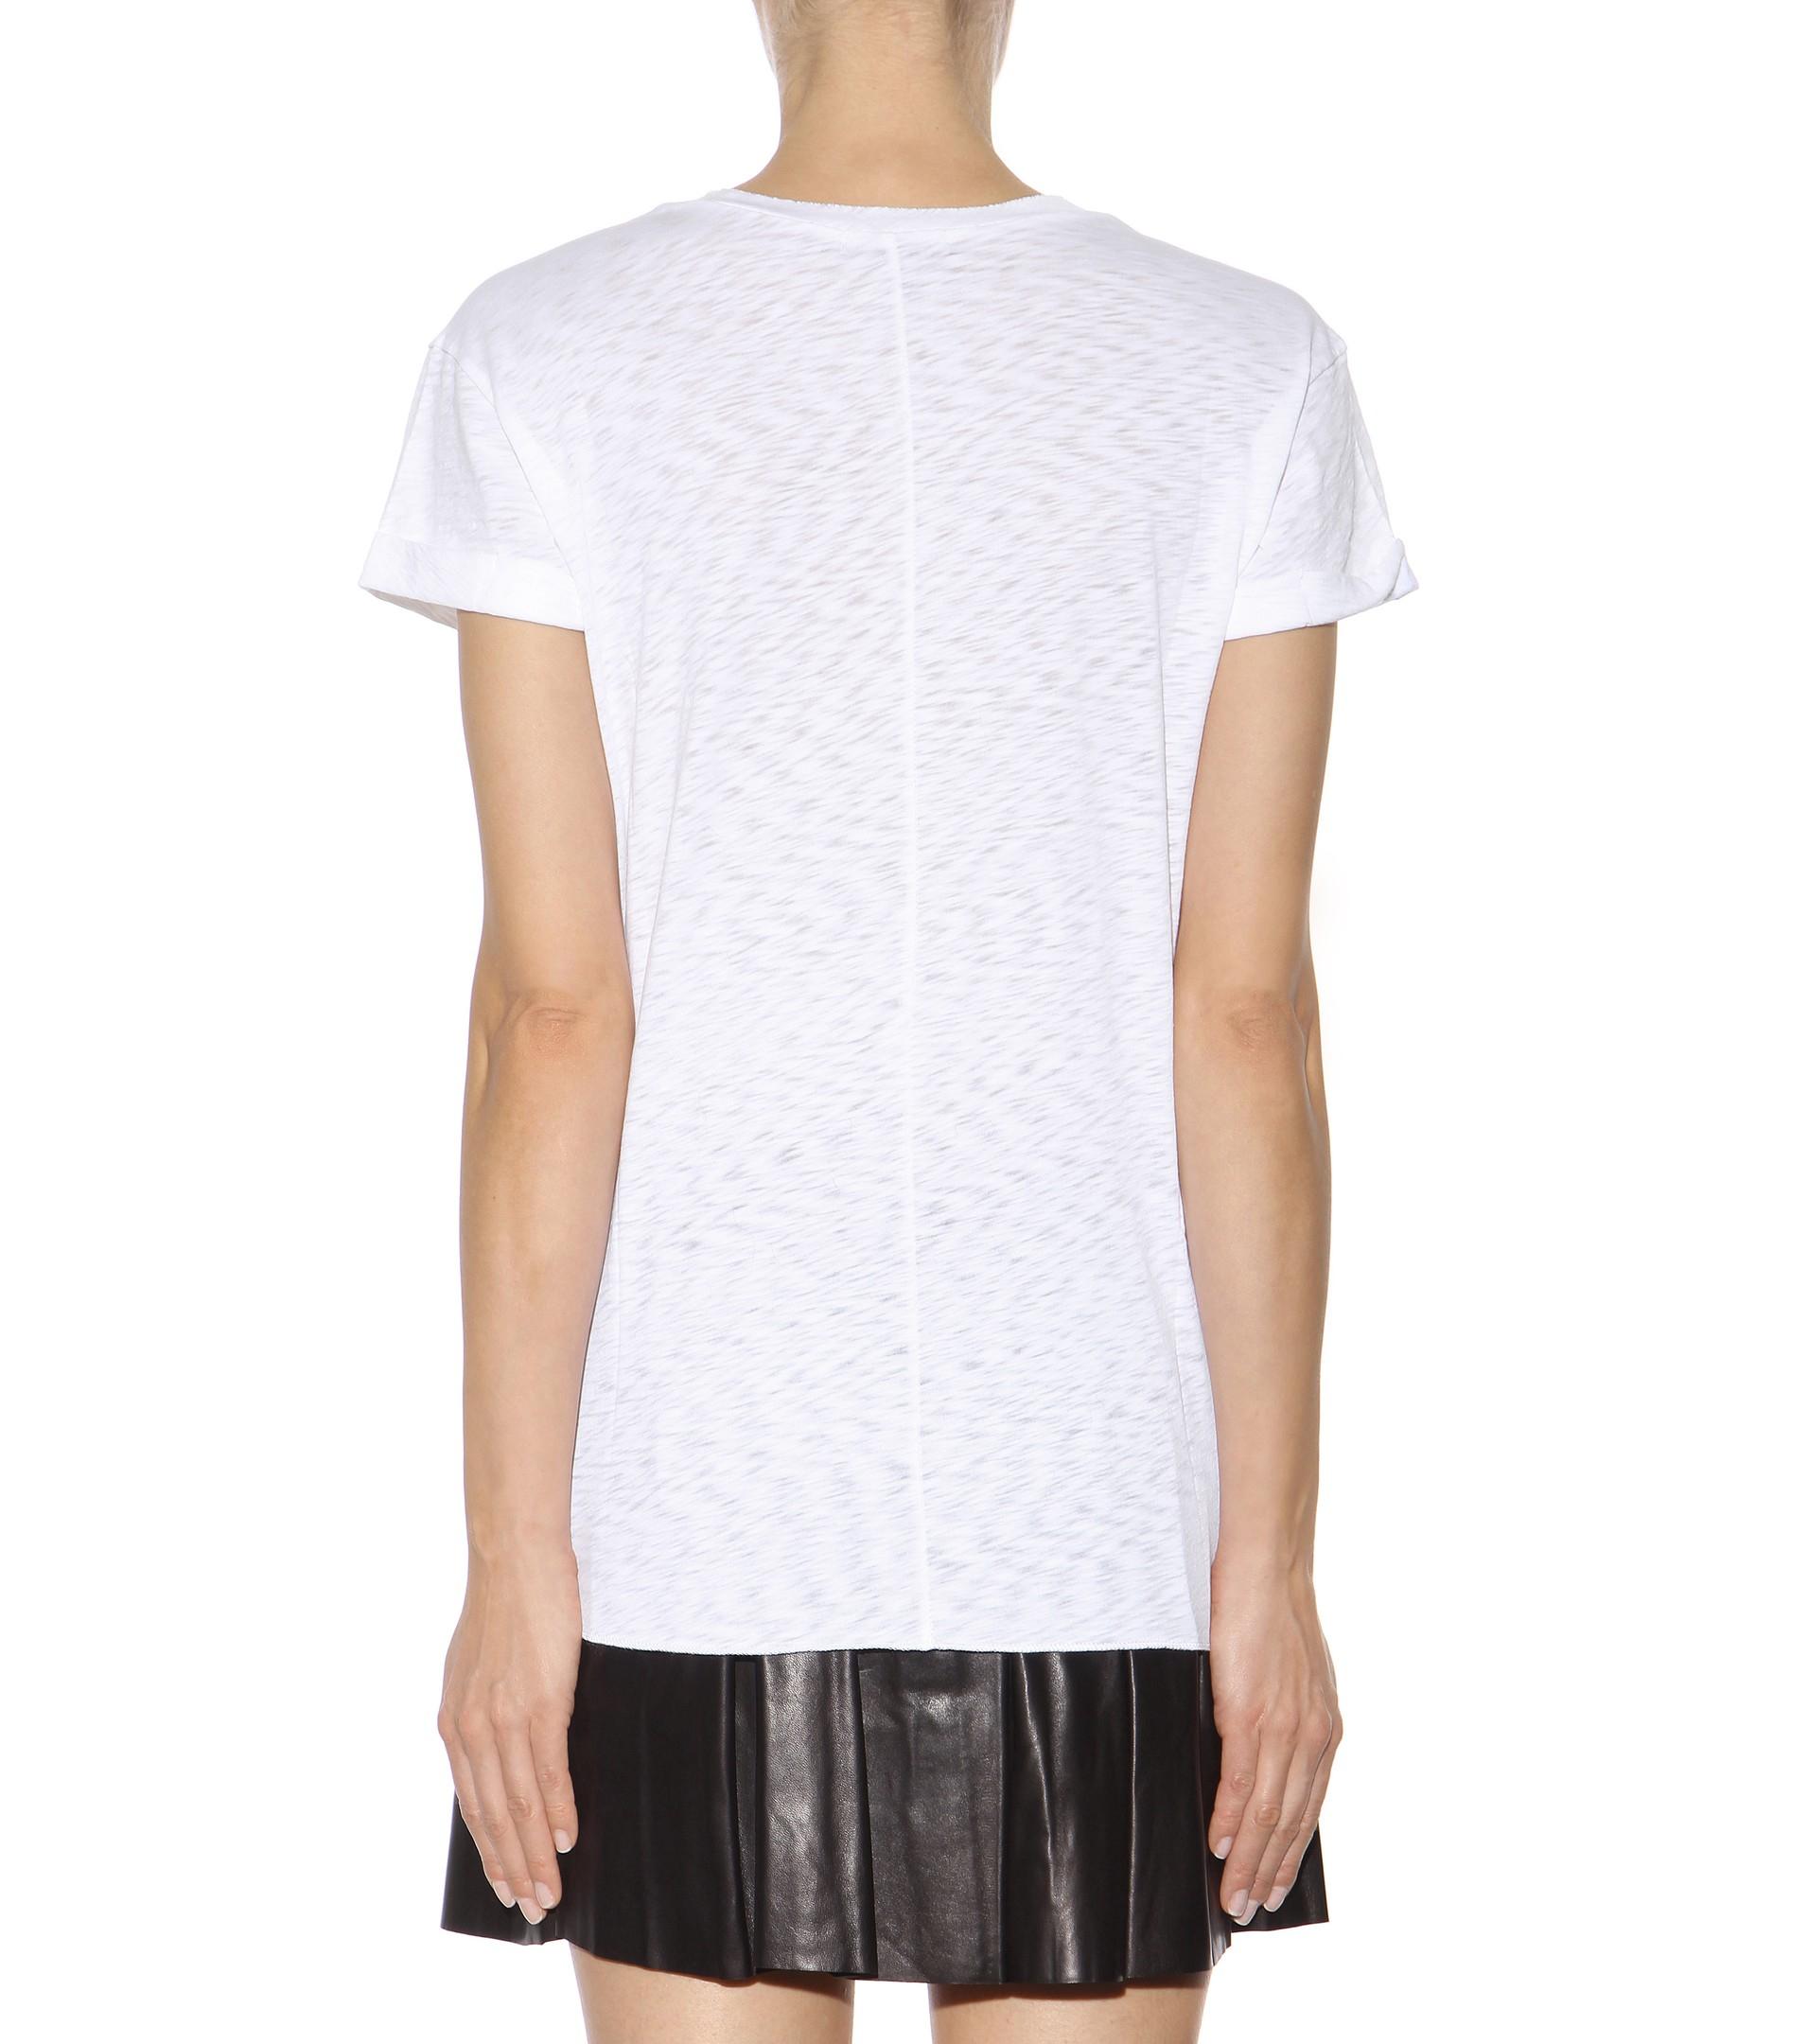 Rag Bone The Pocket Cotton T Shirt In White Lyst